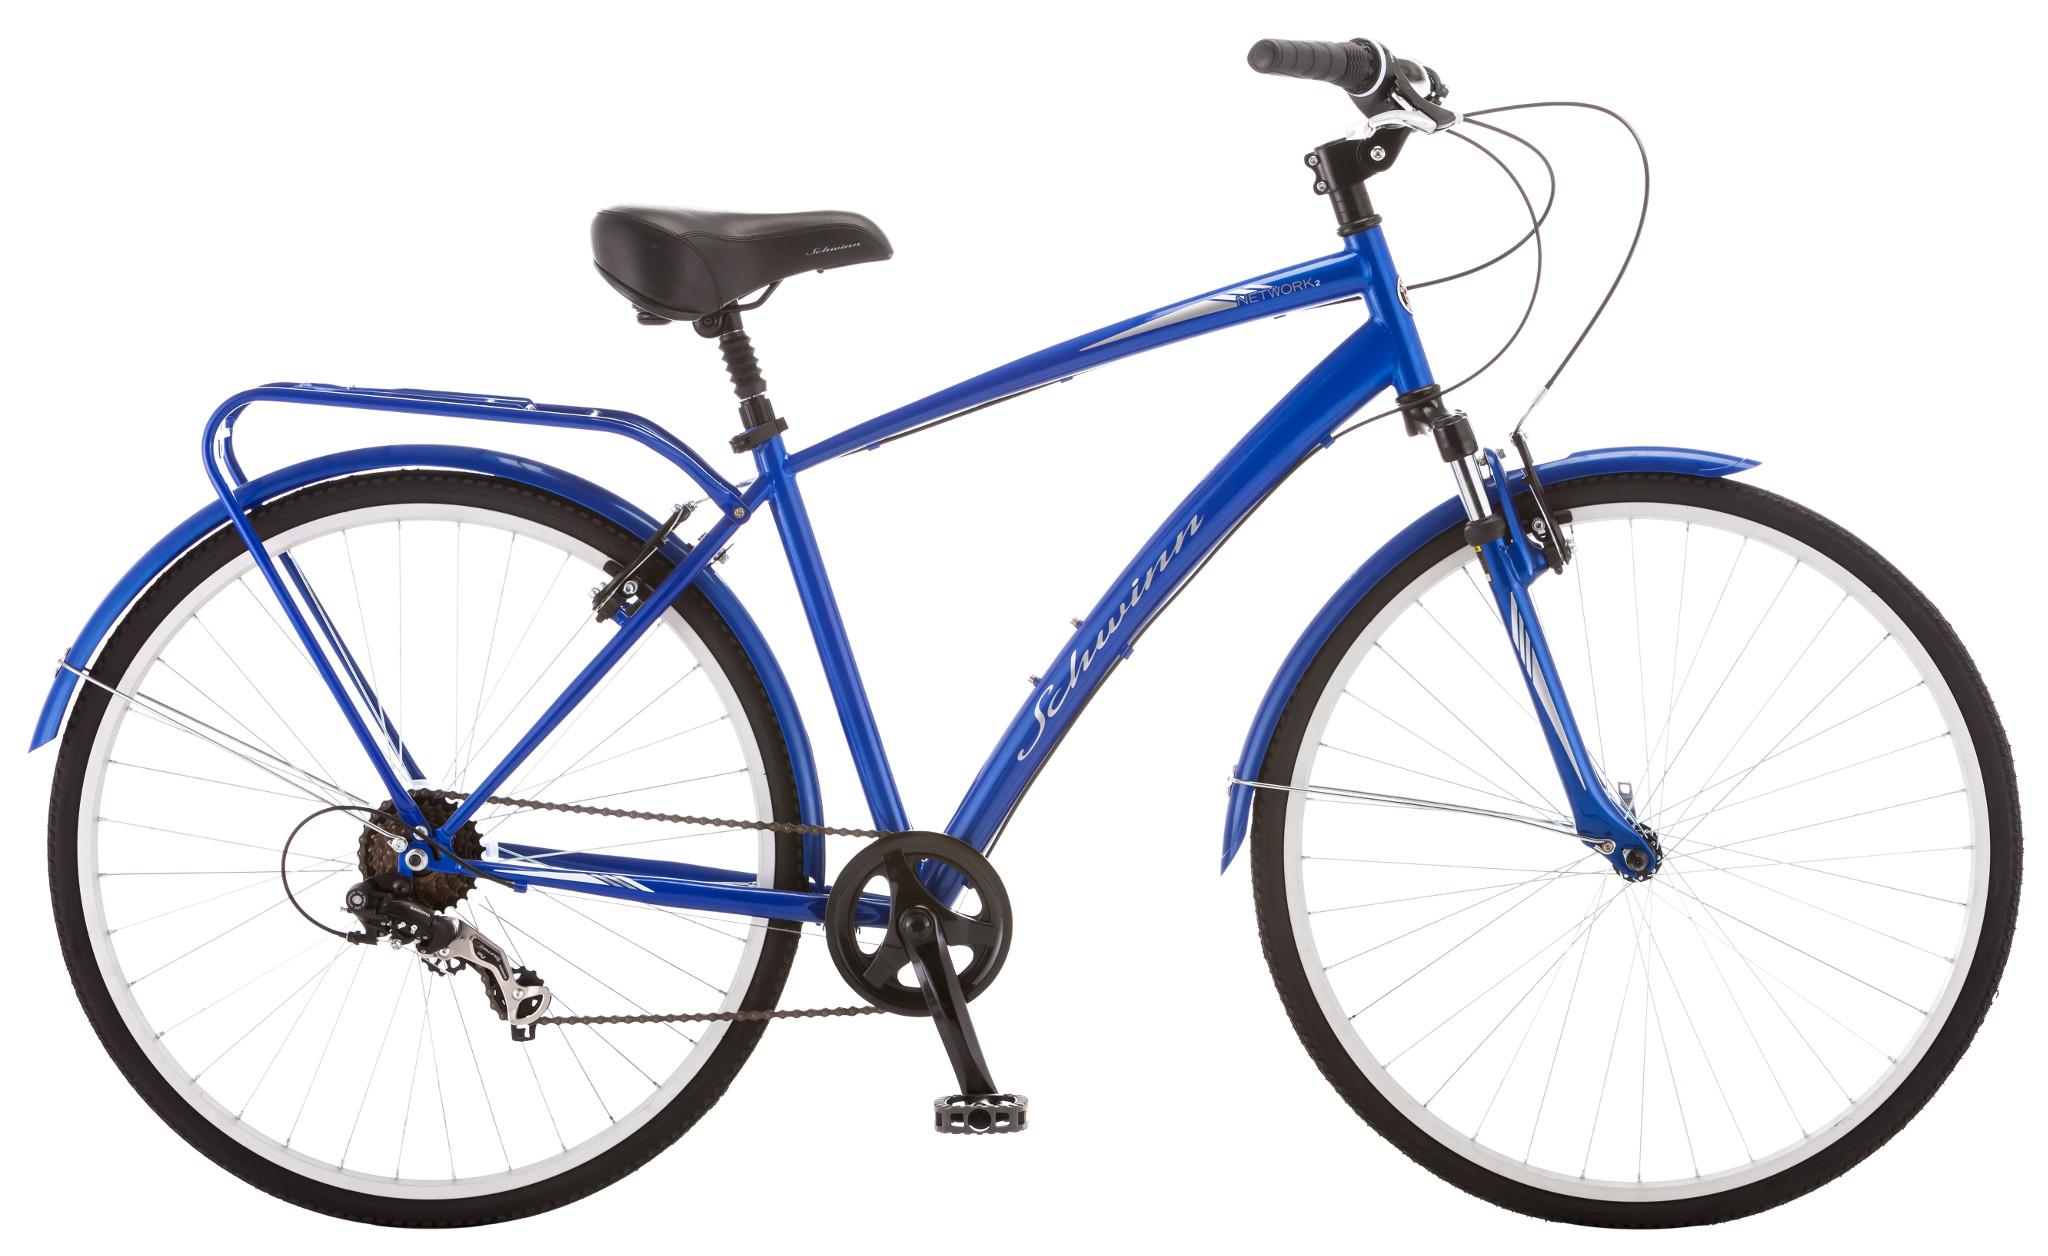 2 Seater Schwinn Bike Parts : Schwinn network men s speed hybrid city bike blue